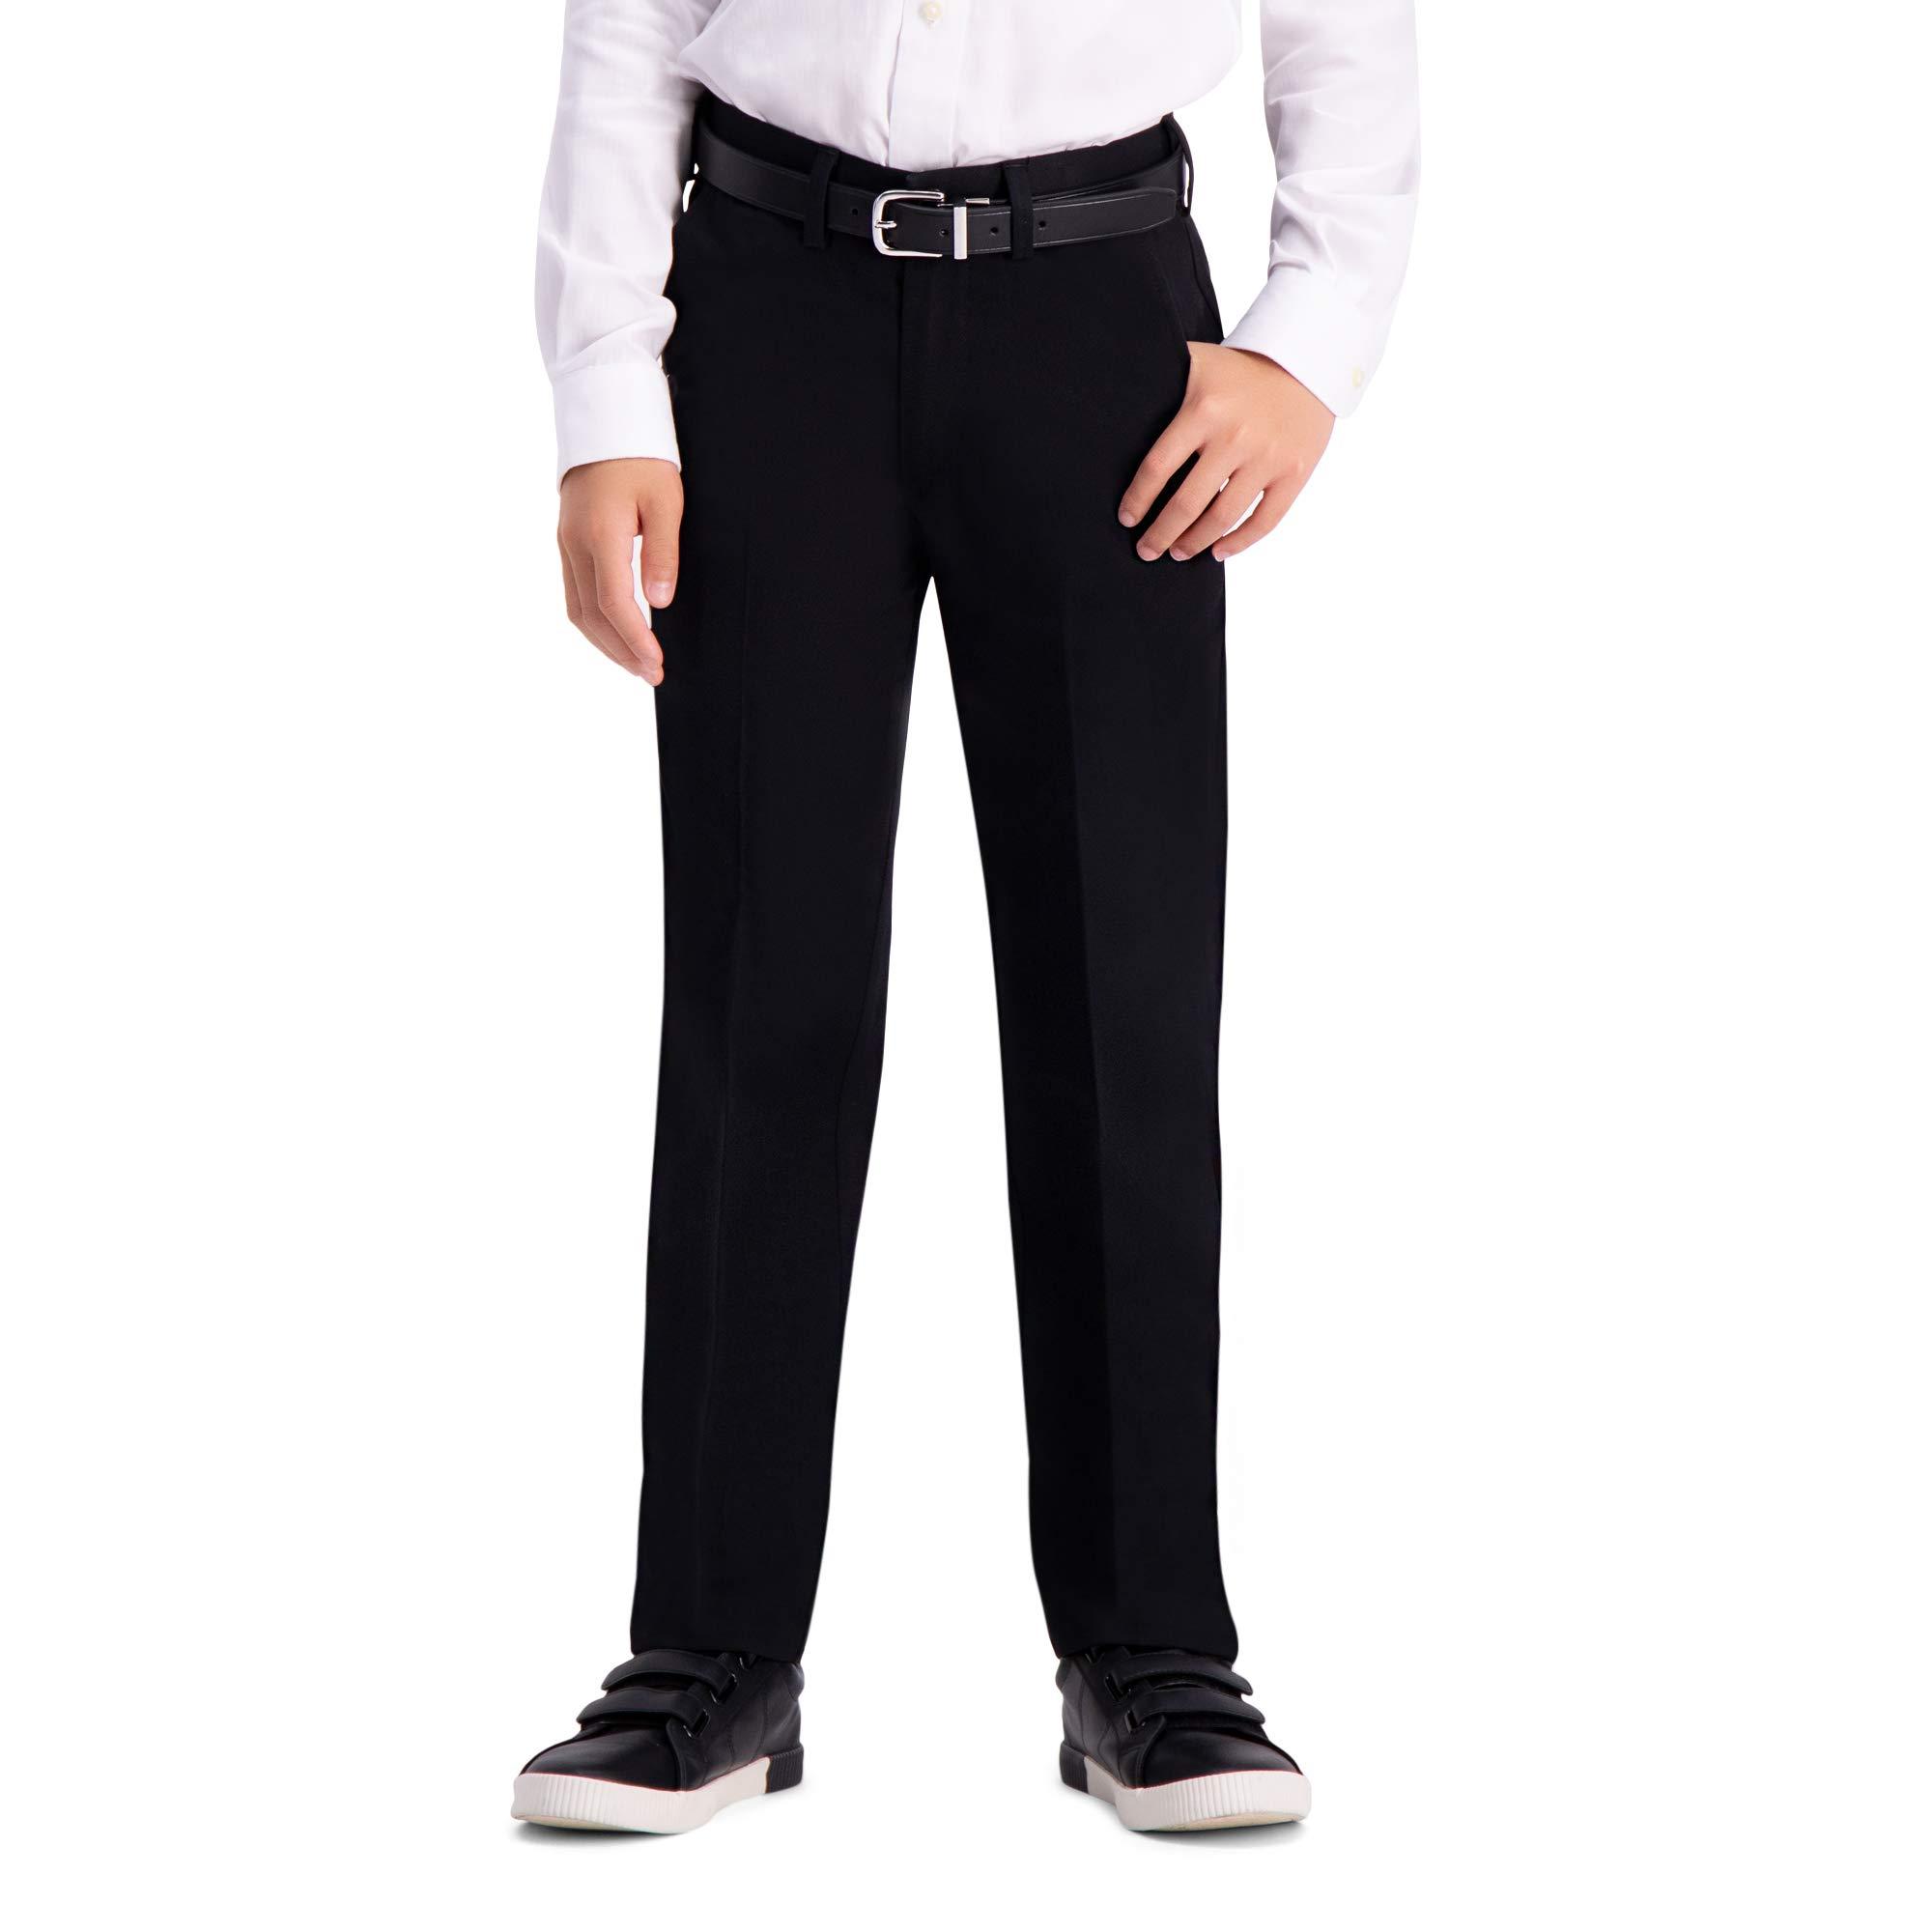 Haggar Big Boy's Youth Regular 8-20 Premium No Iron Khaki Pant, Black, 16 REG by Haggar